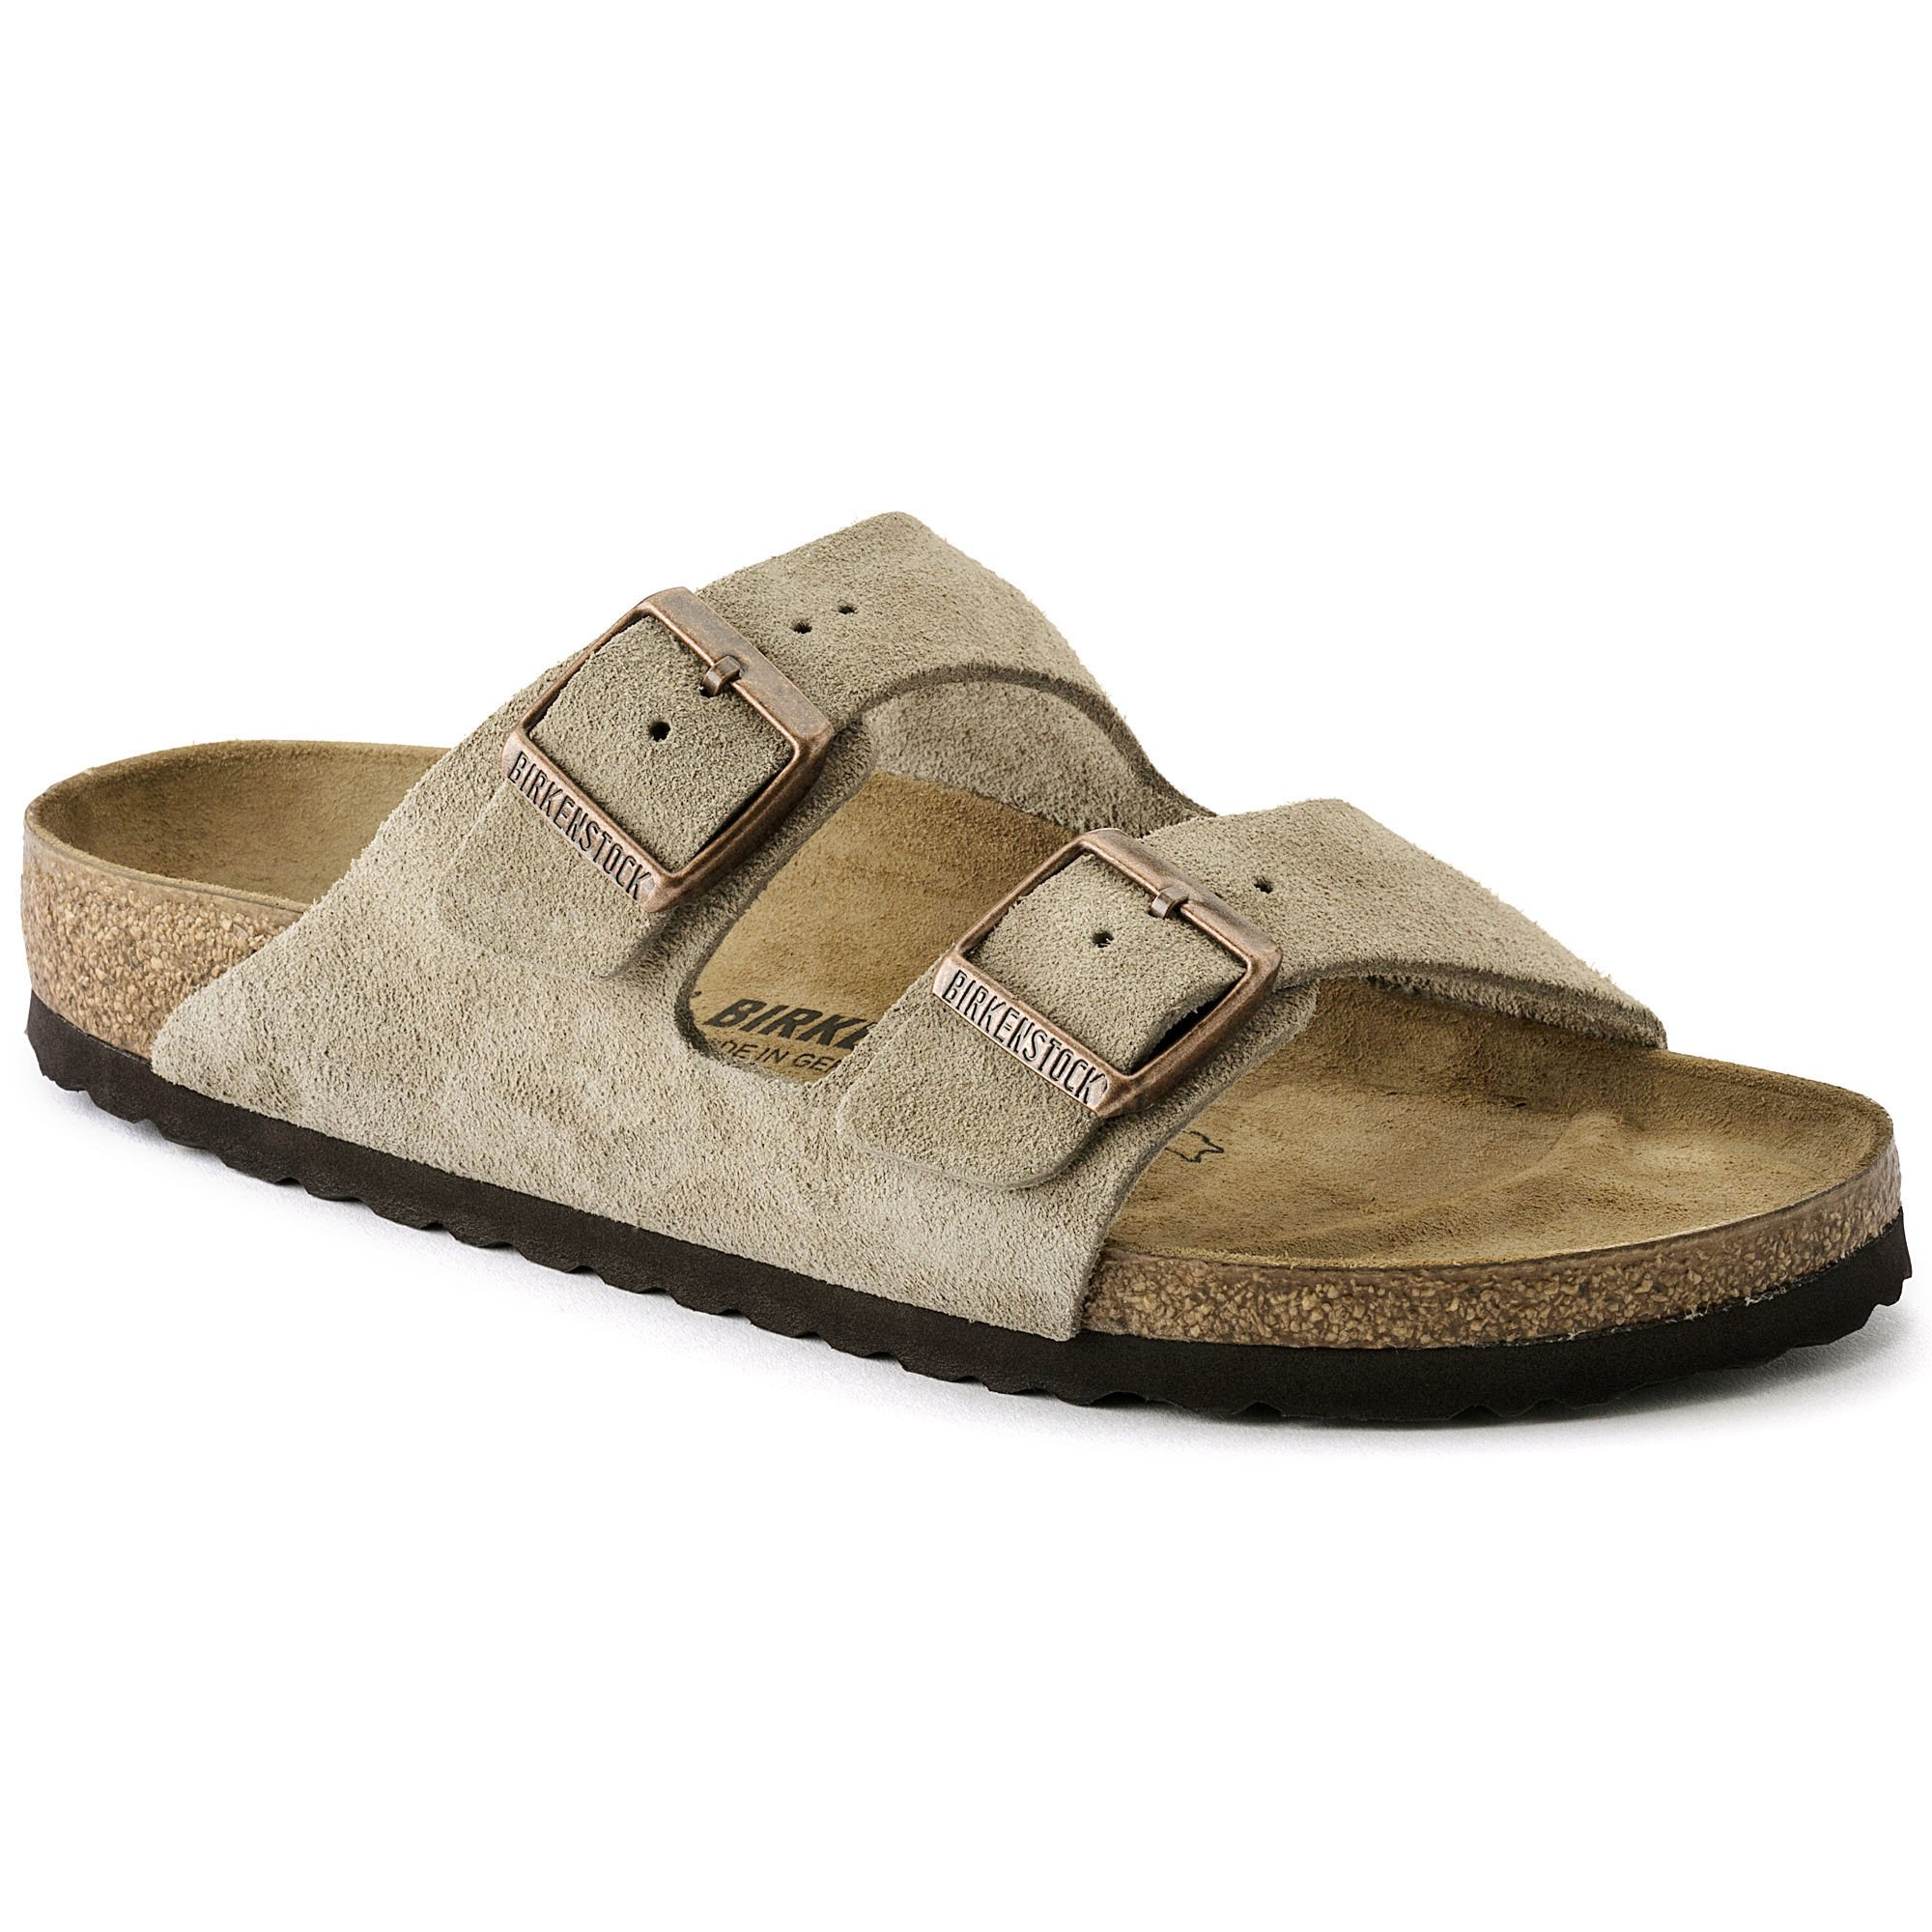 Birkenstock Arizona 2-Strap Suede Leather Sandals, Taupe, Unisex, 39 N EU Narrow Width - US Women 8-8.5